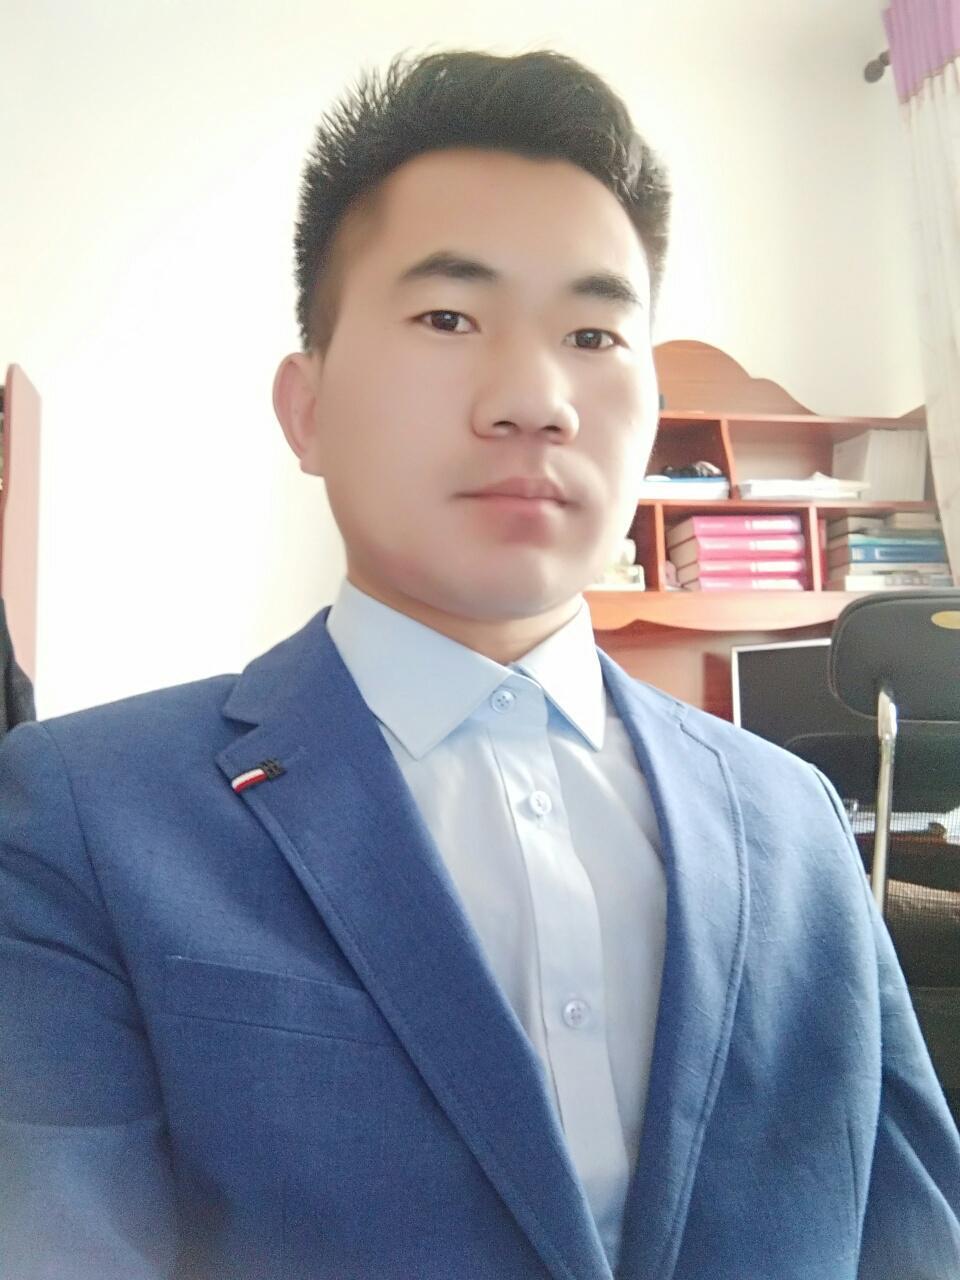 BruceTong